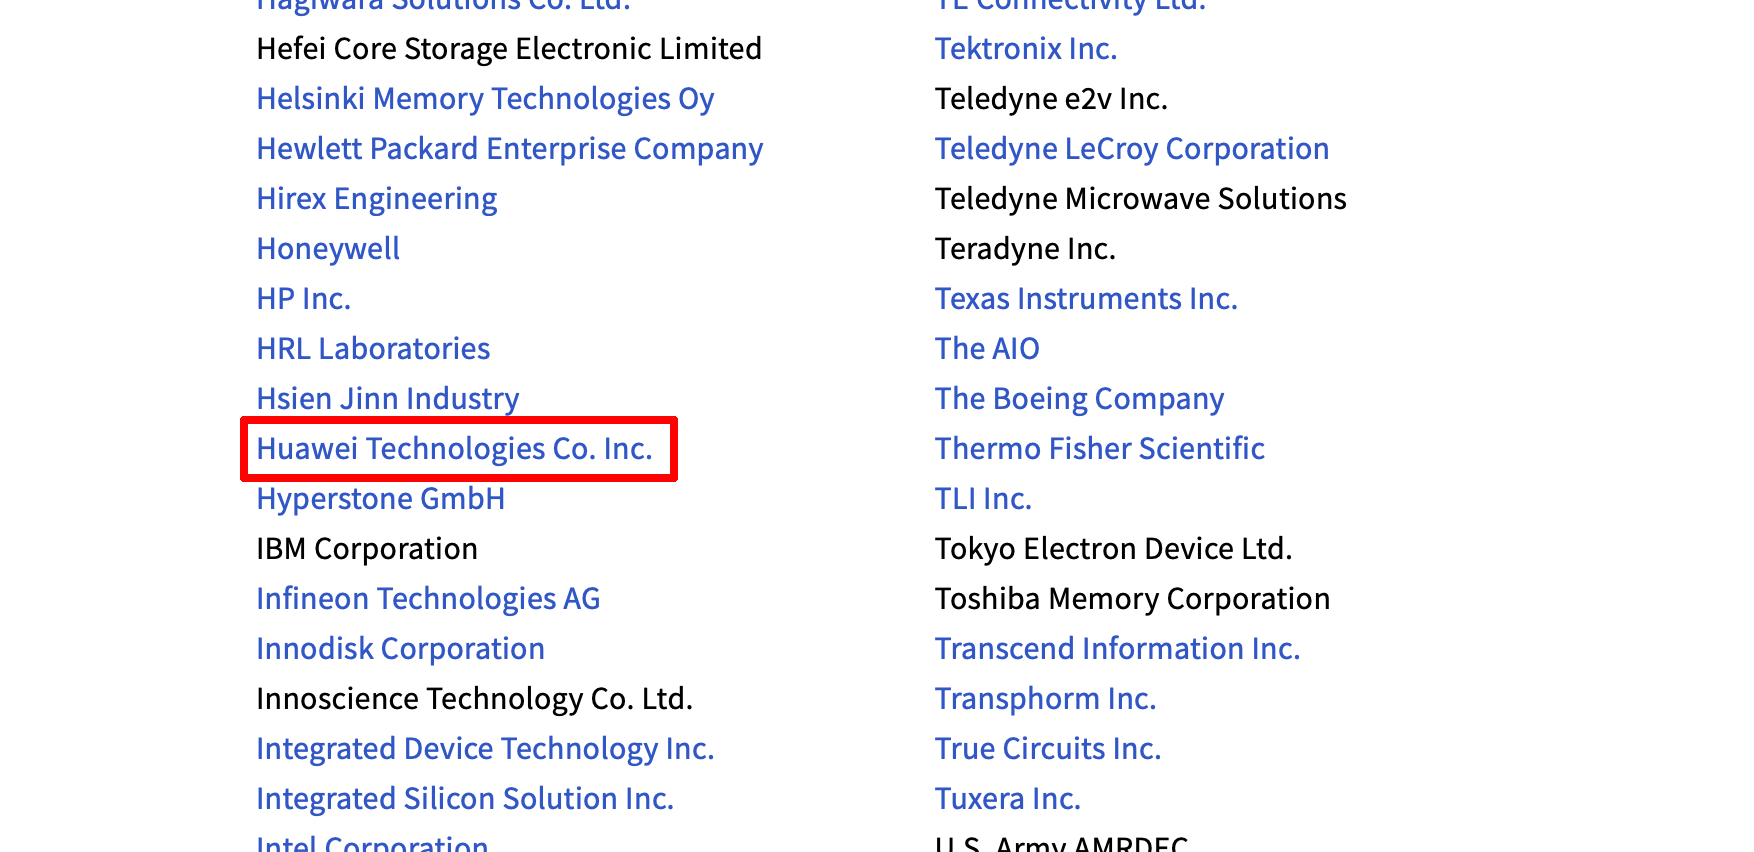 WiFi联盟、蓝牙联盟、JEDEC协会已恢复华为成员资格